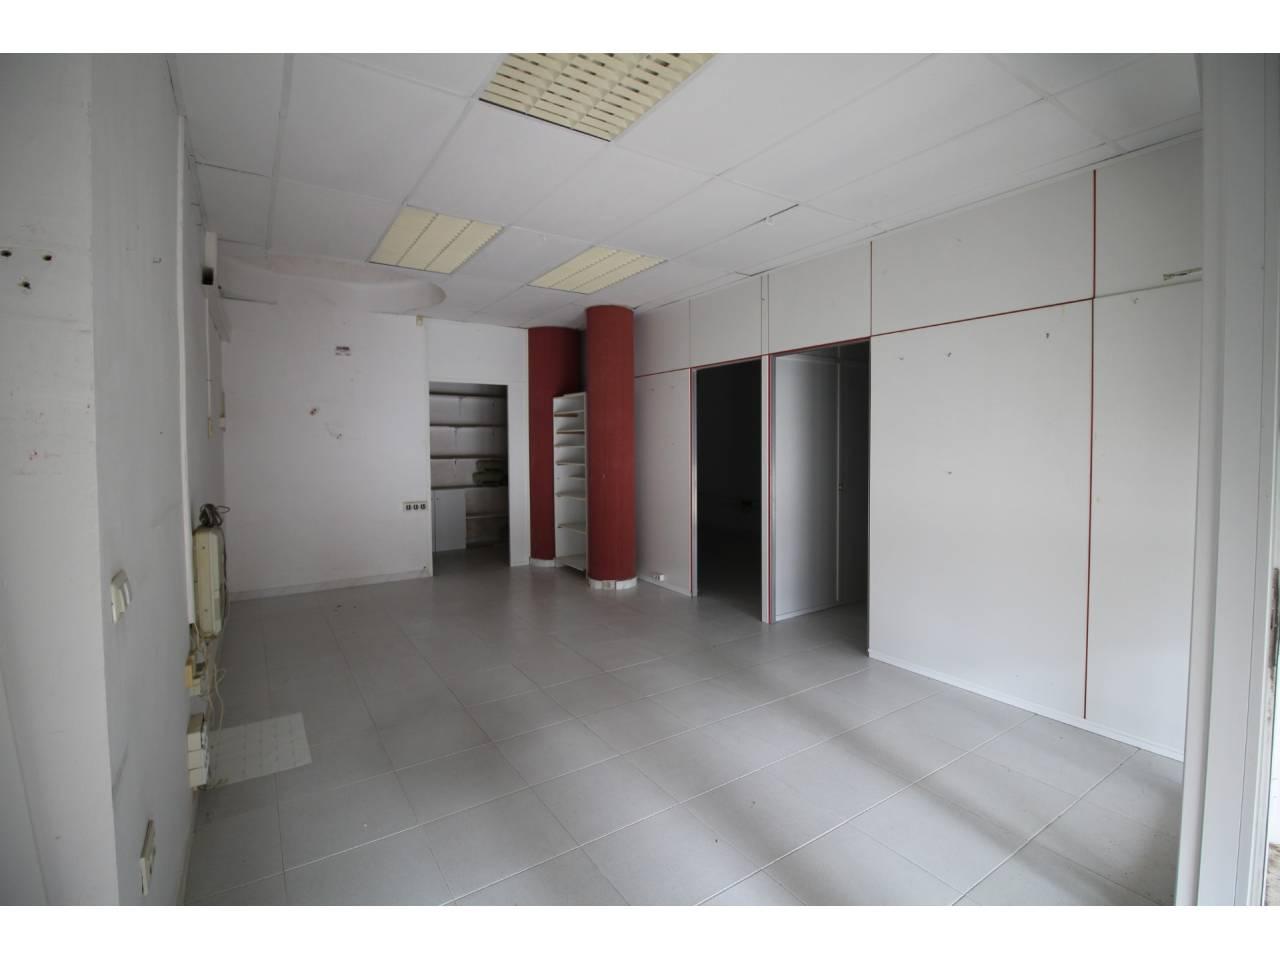 005048 - CLUB NAUTIC Commercial Premise